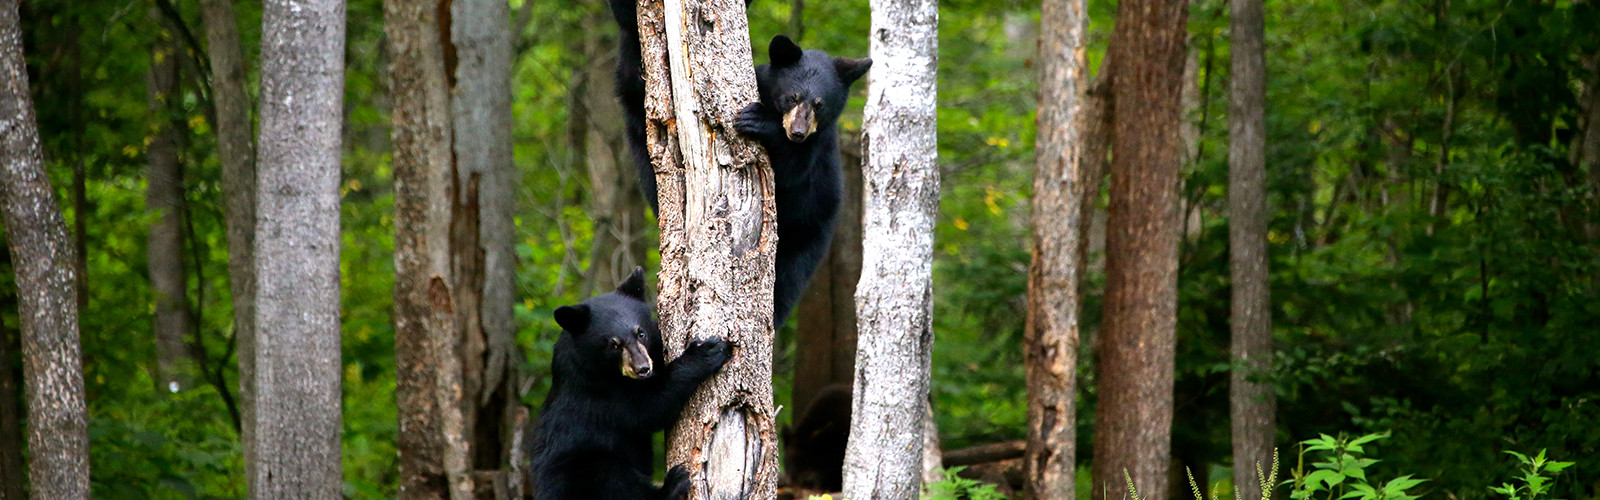 Bears of the World   American Bear Association